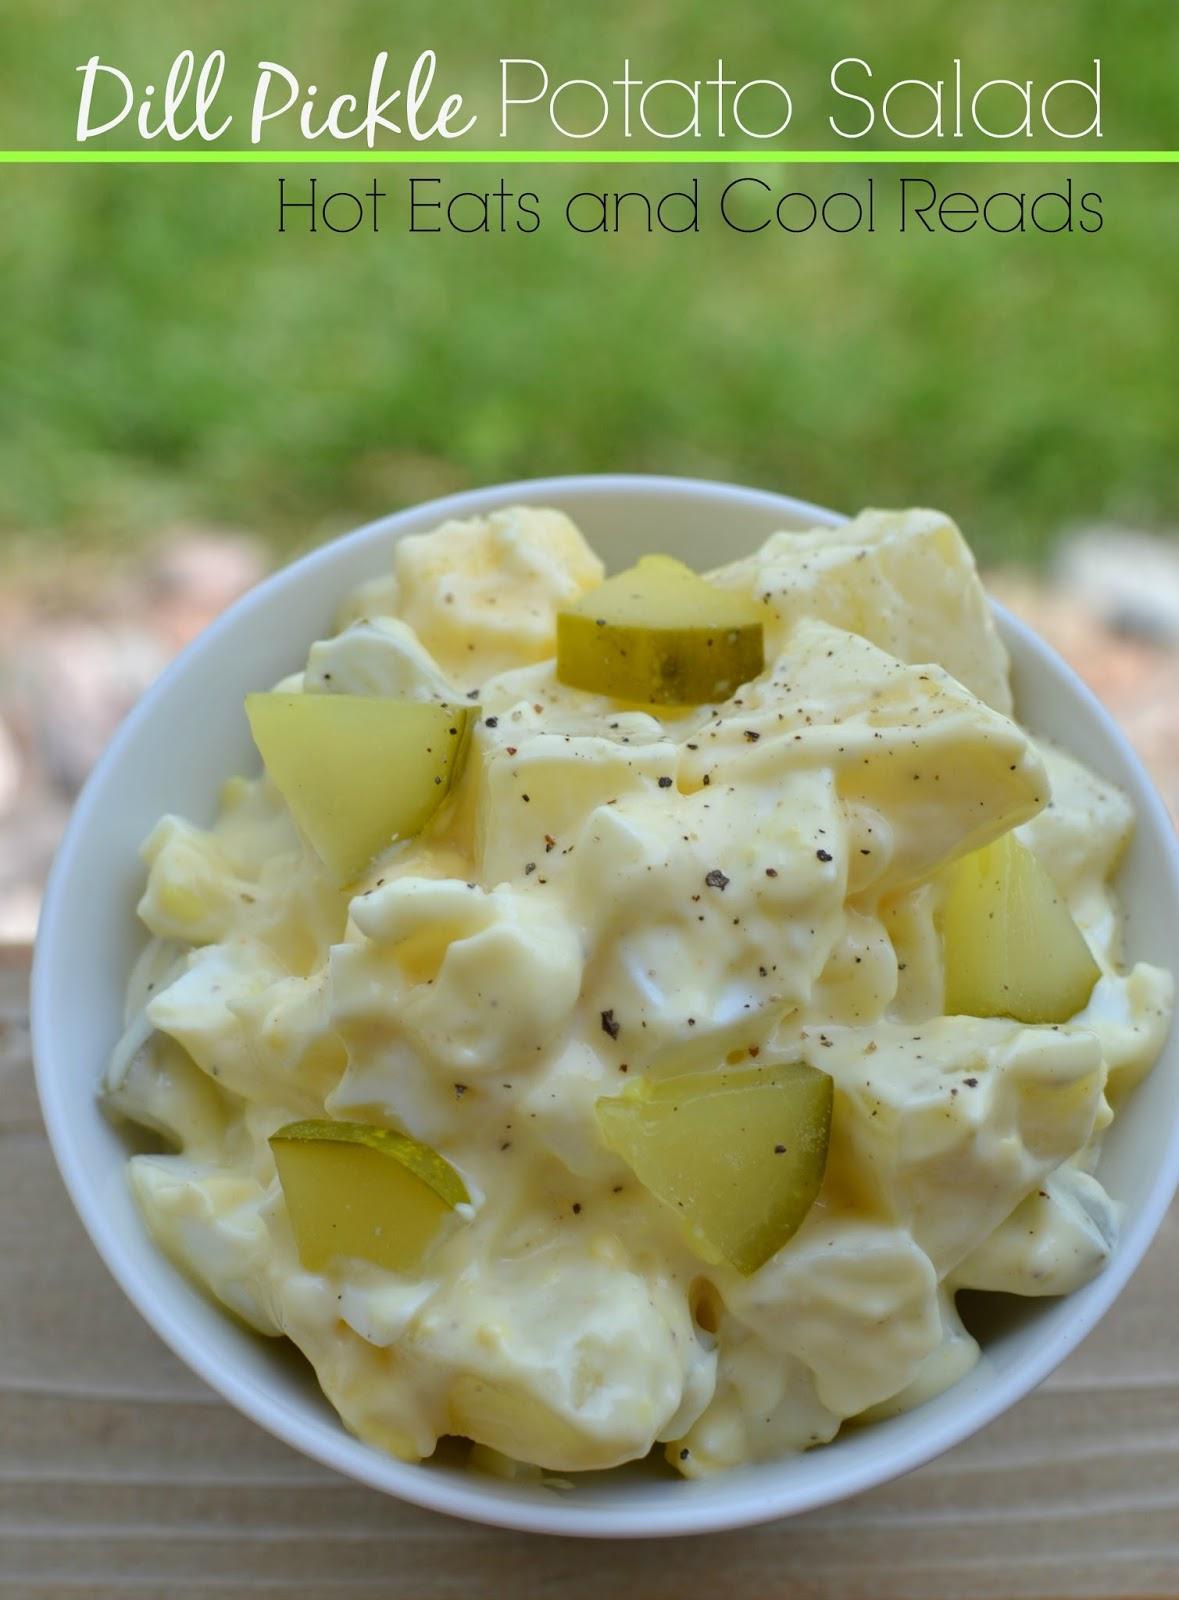 Salad of pickles: recipes